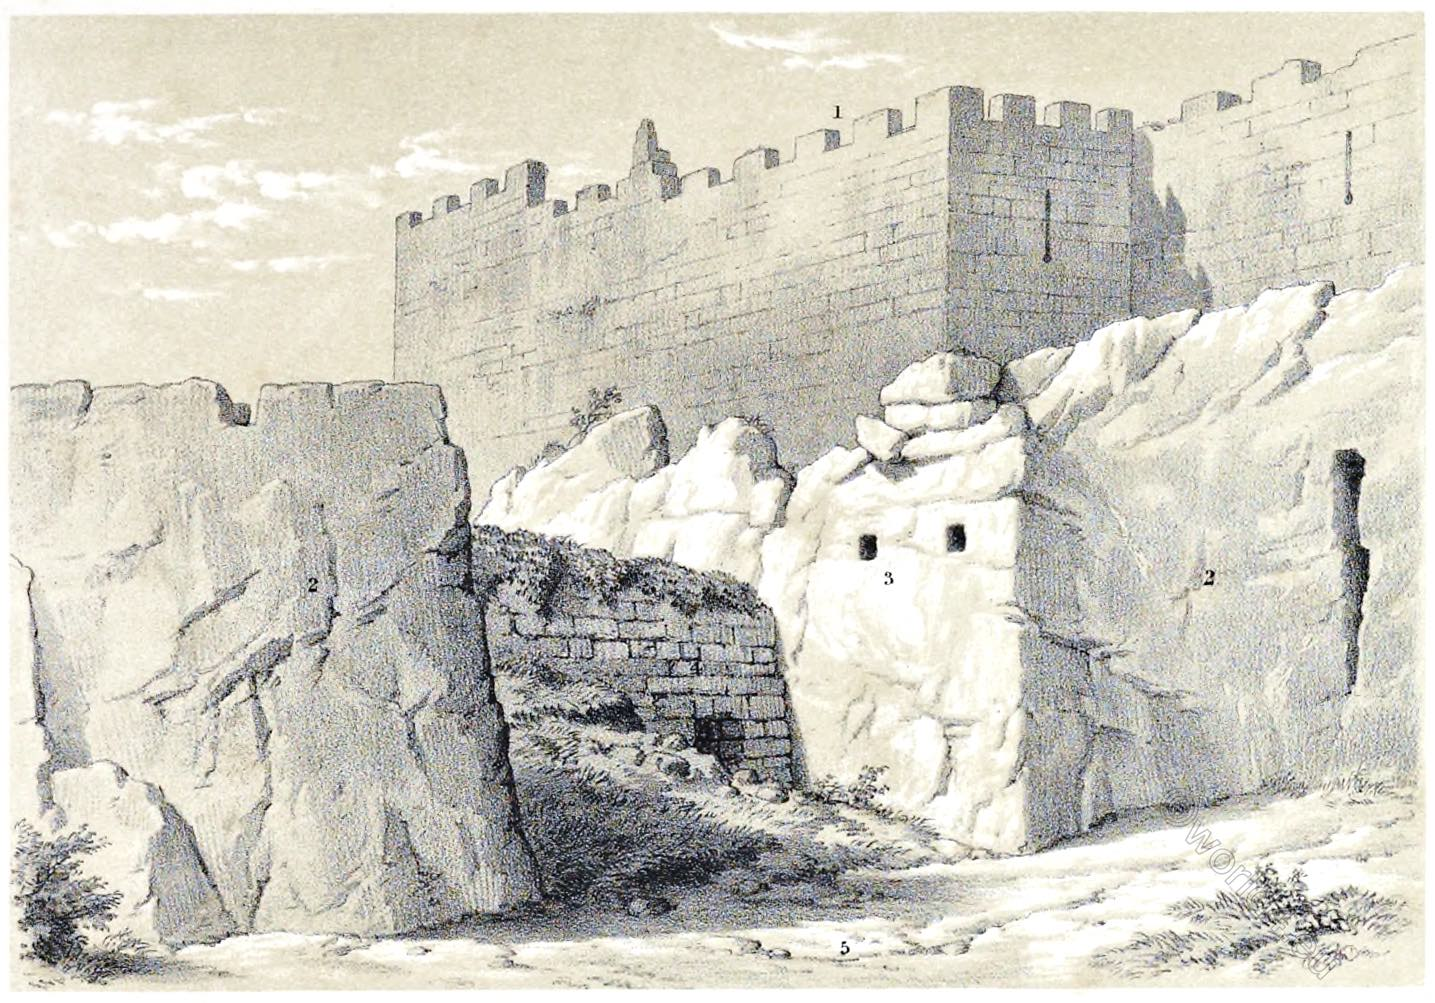 Jerusalem, Royal, Caverns, Architecture, Holy, Land, Ermete Pierotti,